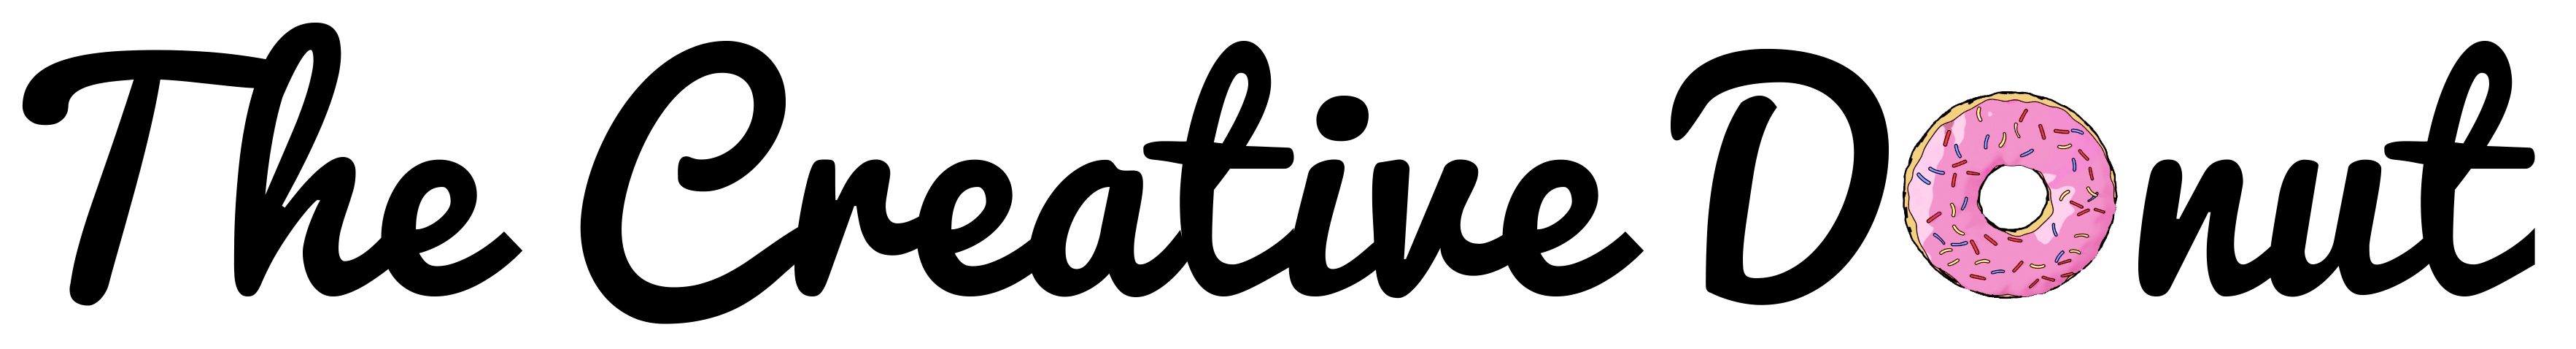 donut logo branding black creative donut website design newbury berkshire sam lee